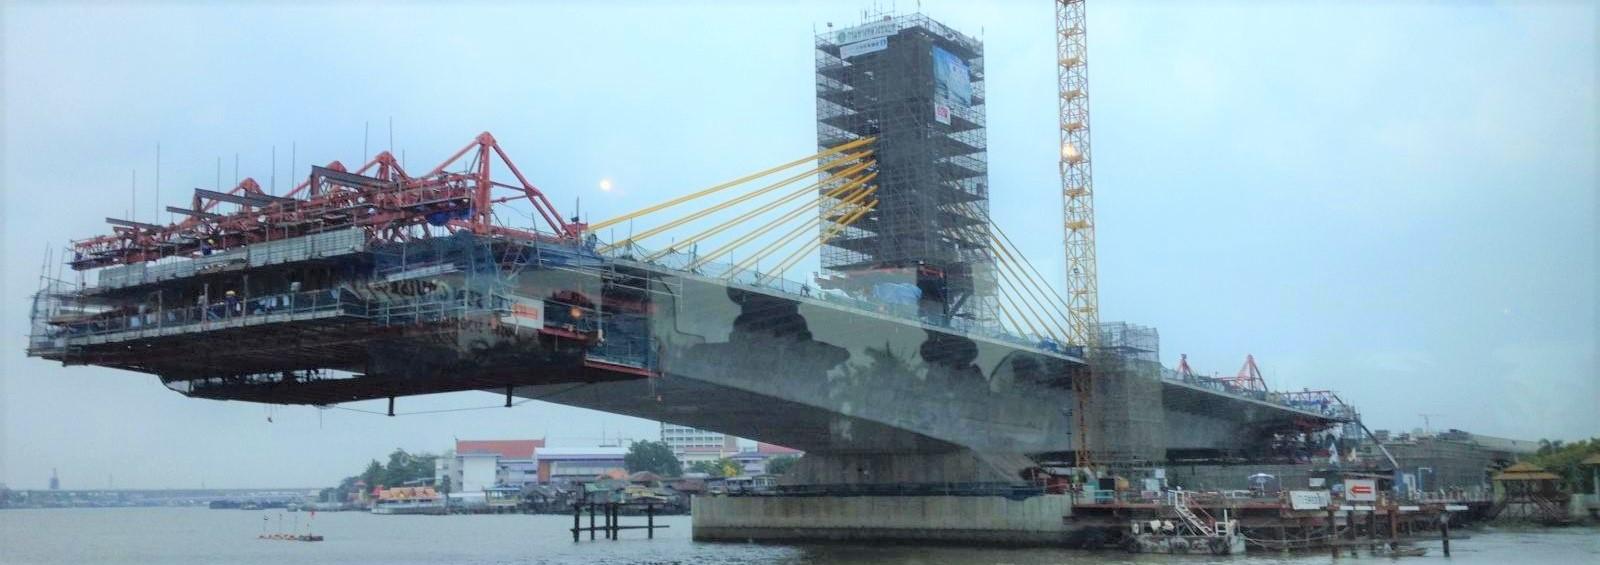 Bangkok bridge construction (Photo: Flickr/Harry Wood)